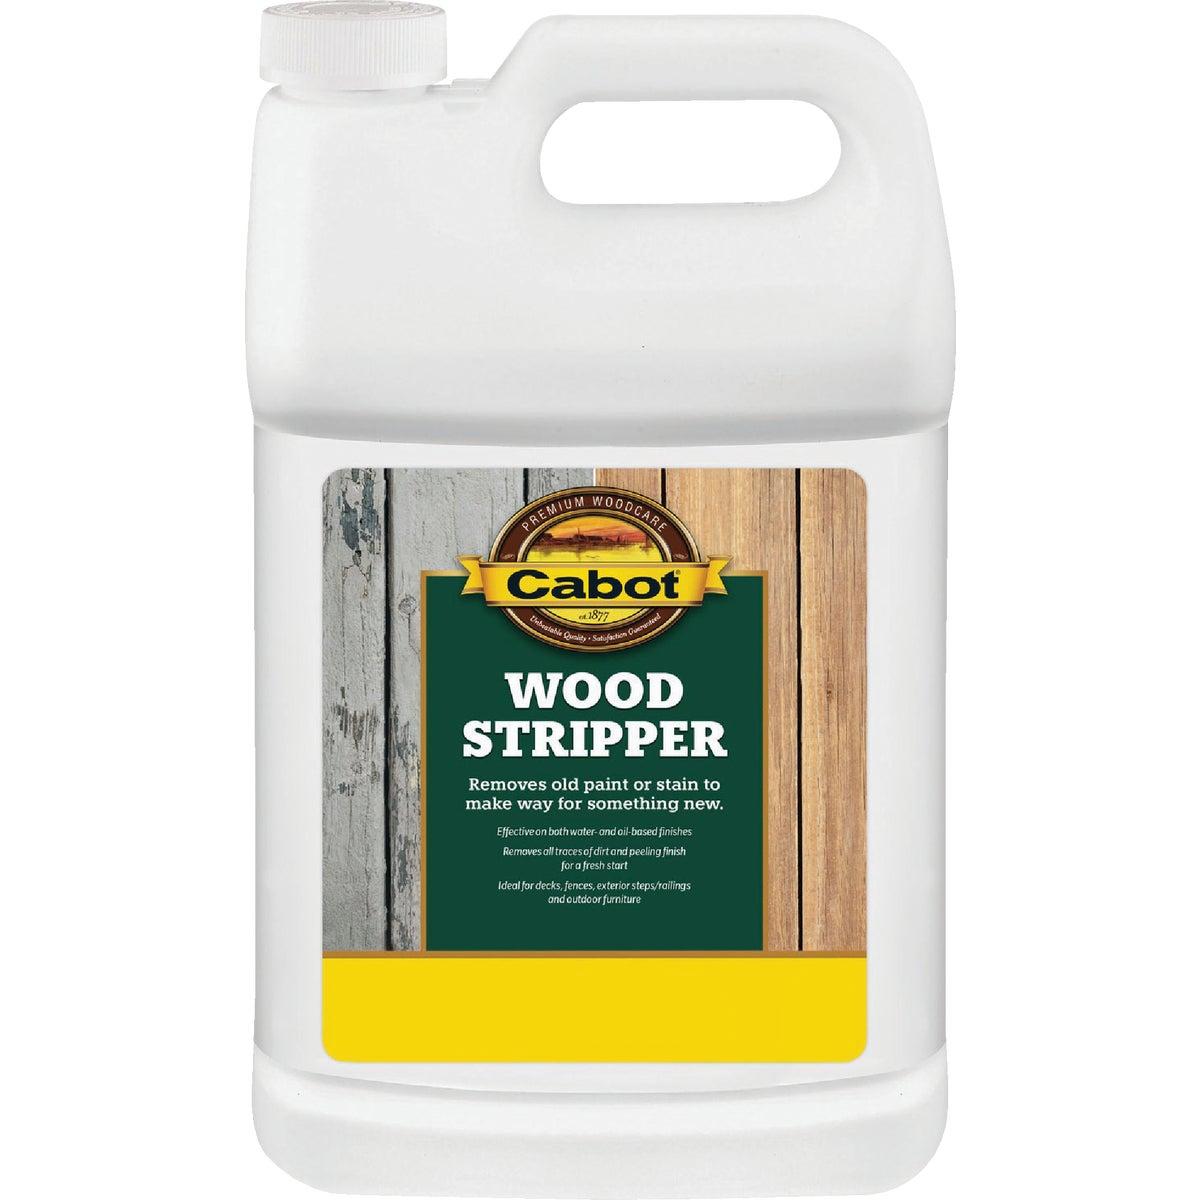 WOOD STRIPPER